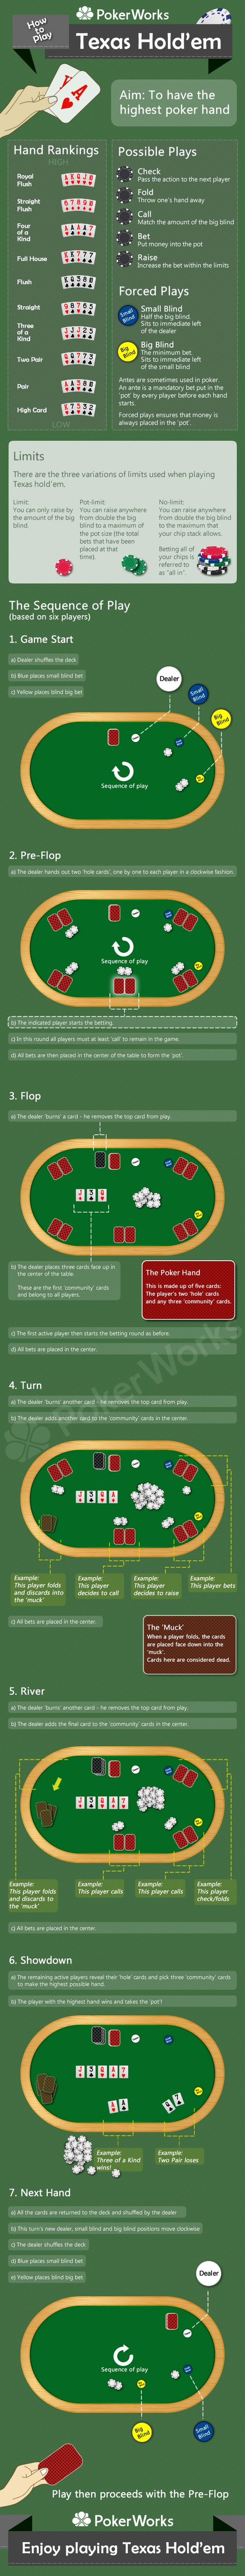 Texas Hold'em Rules | PokerWorks